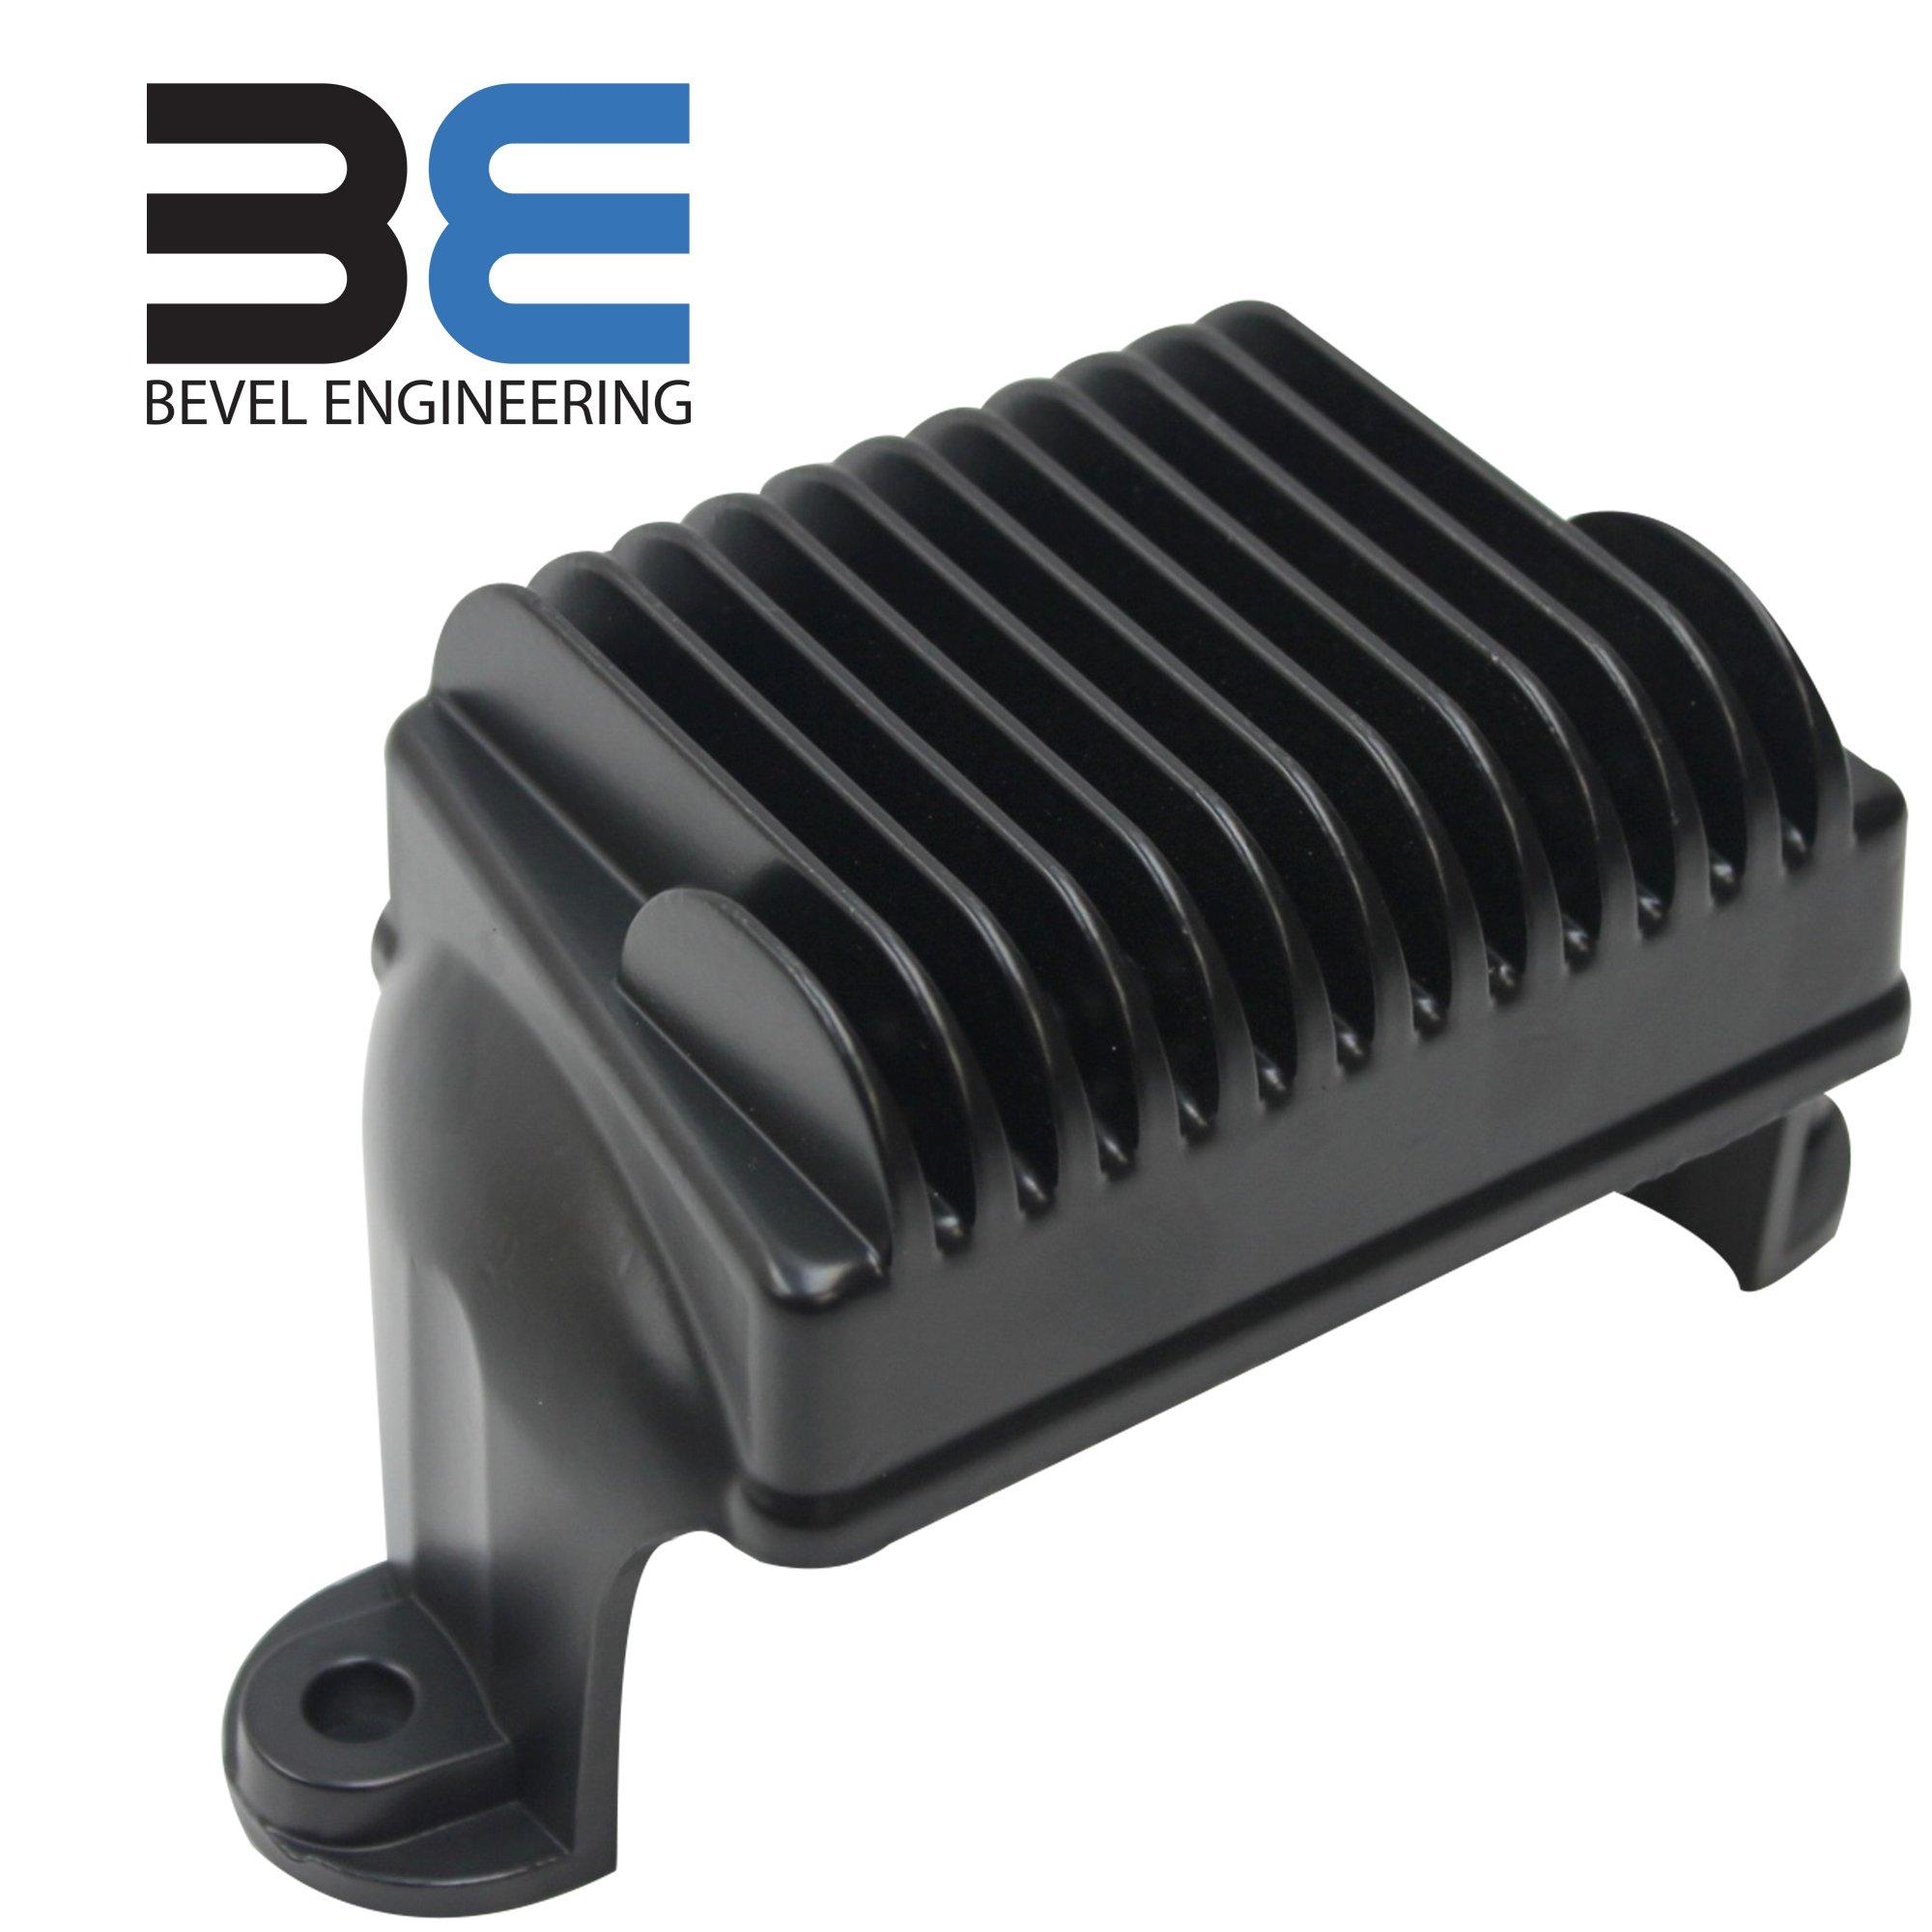 Bevel Engineering Upgraded Voltage Rectifier Regulator for 09-15 Harley Davidson Touring Models Replaces 74505-09 74505-09a